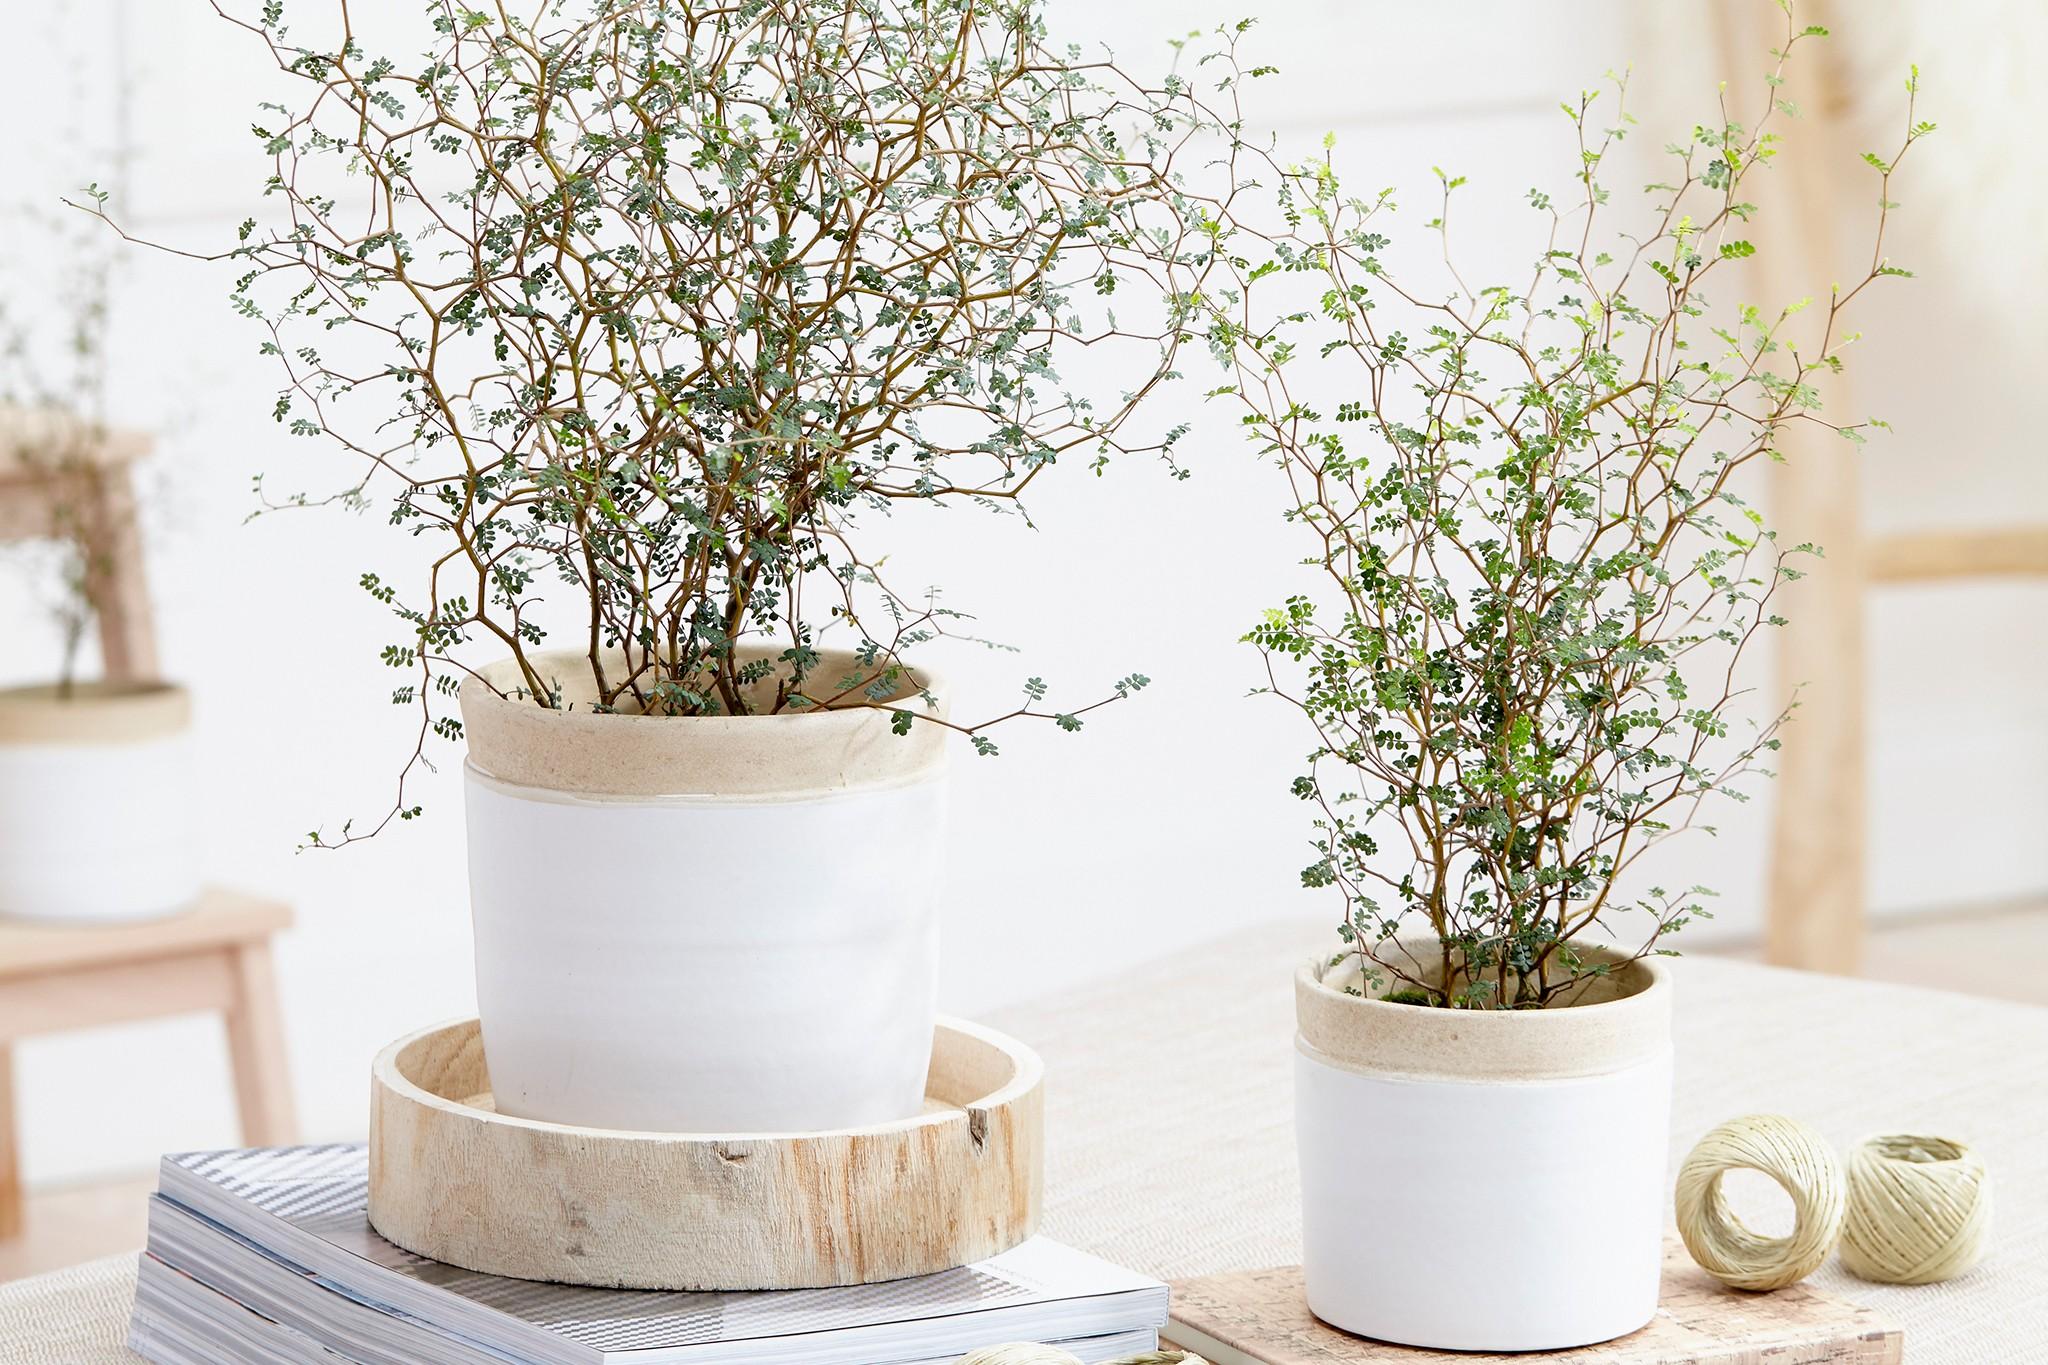 hayloft-sophora-little-baby-half-price-2048-1365